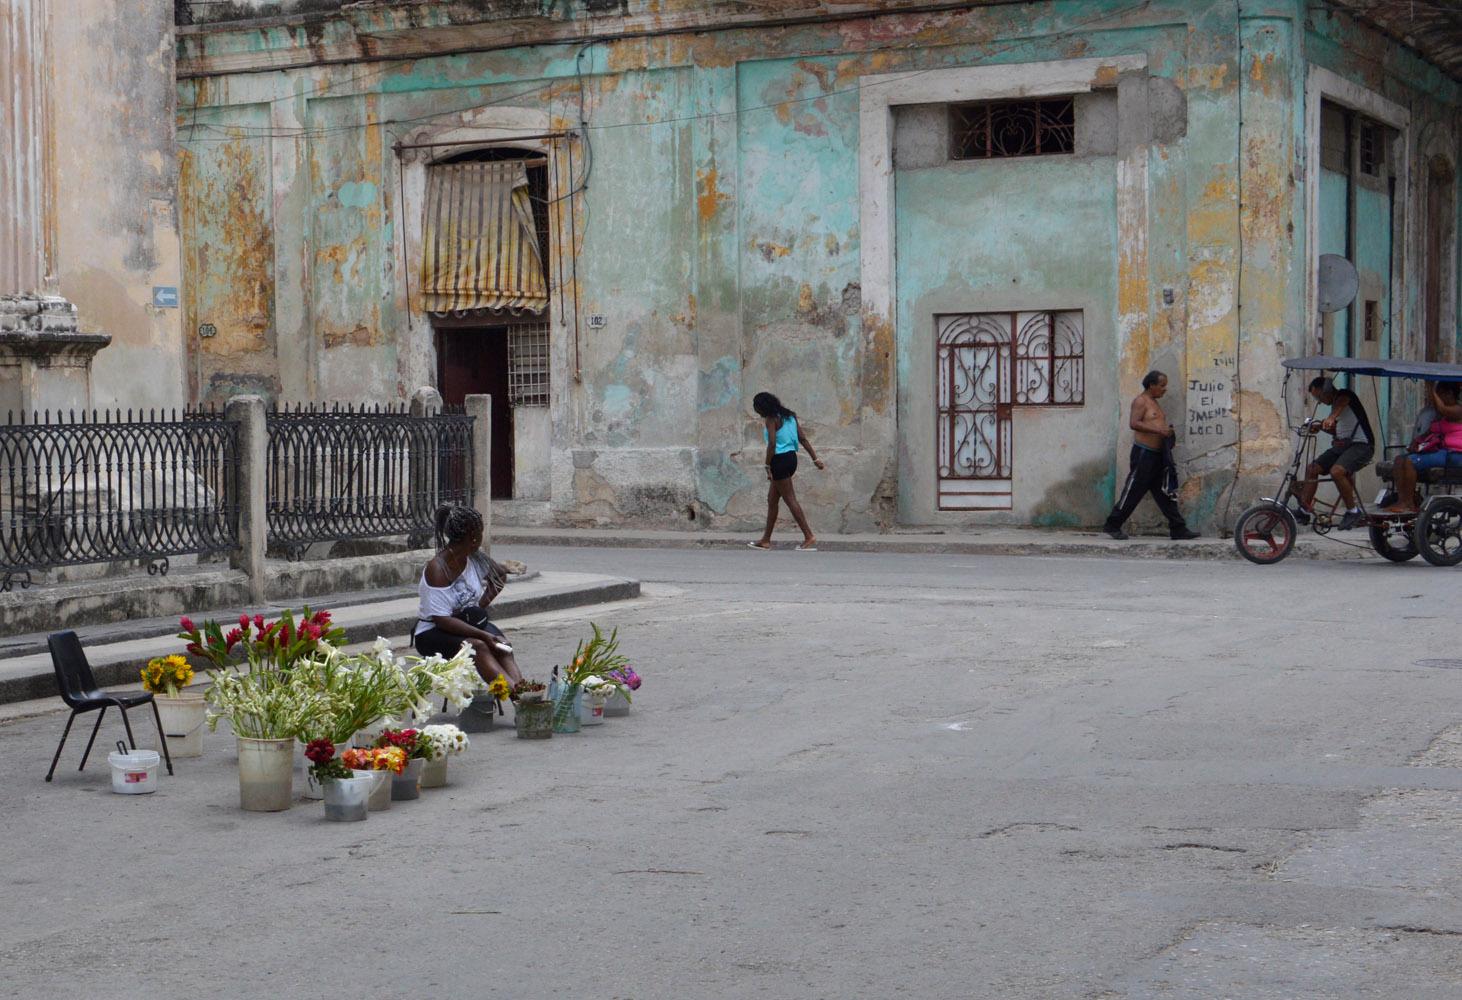 Cuba-Old-Havana-Flower-Seller.jpg